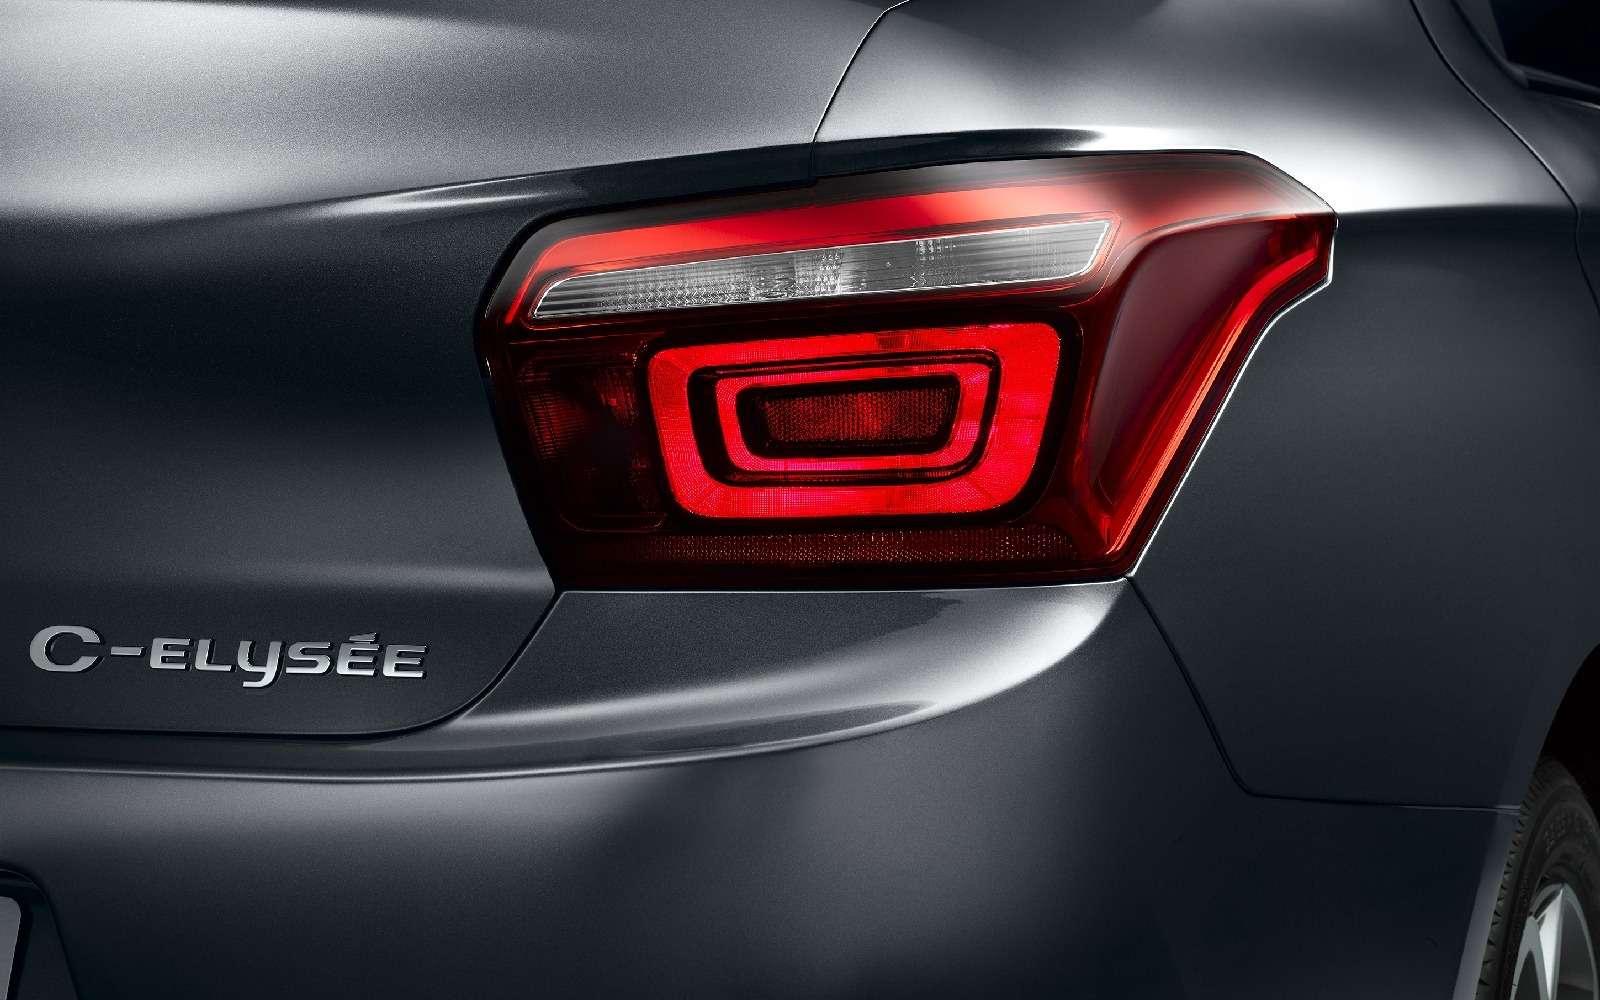 Недоступная дешевизна: Citroen обновил седан C-Elysee— фото 664025